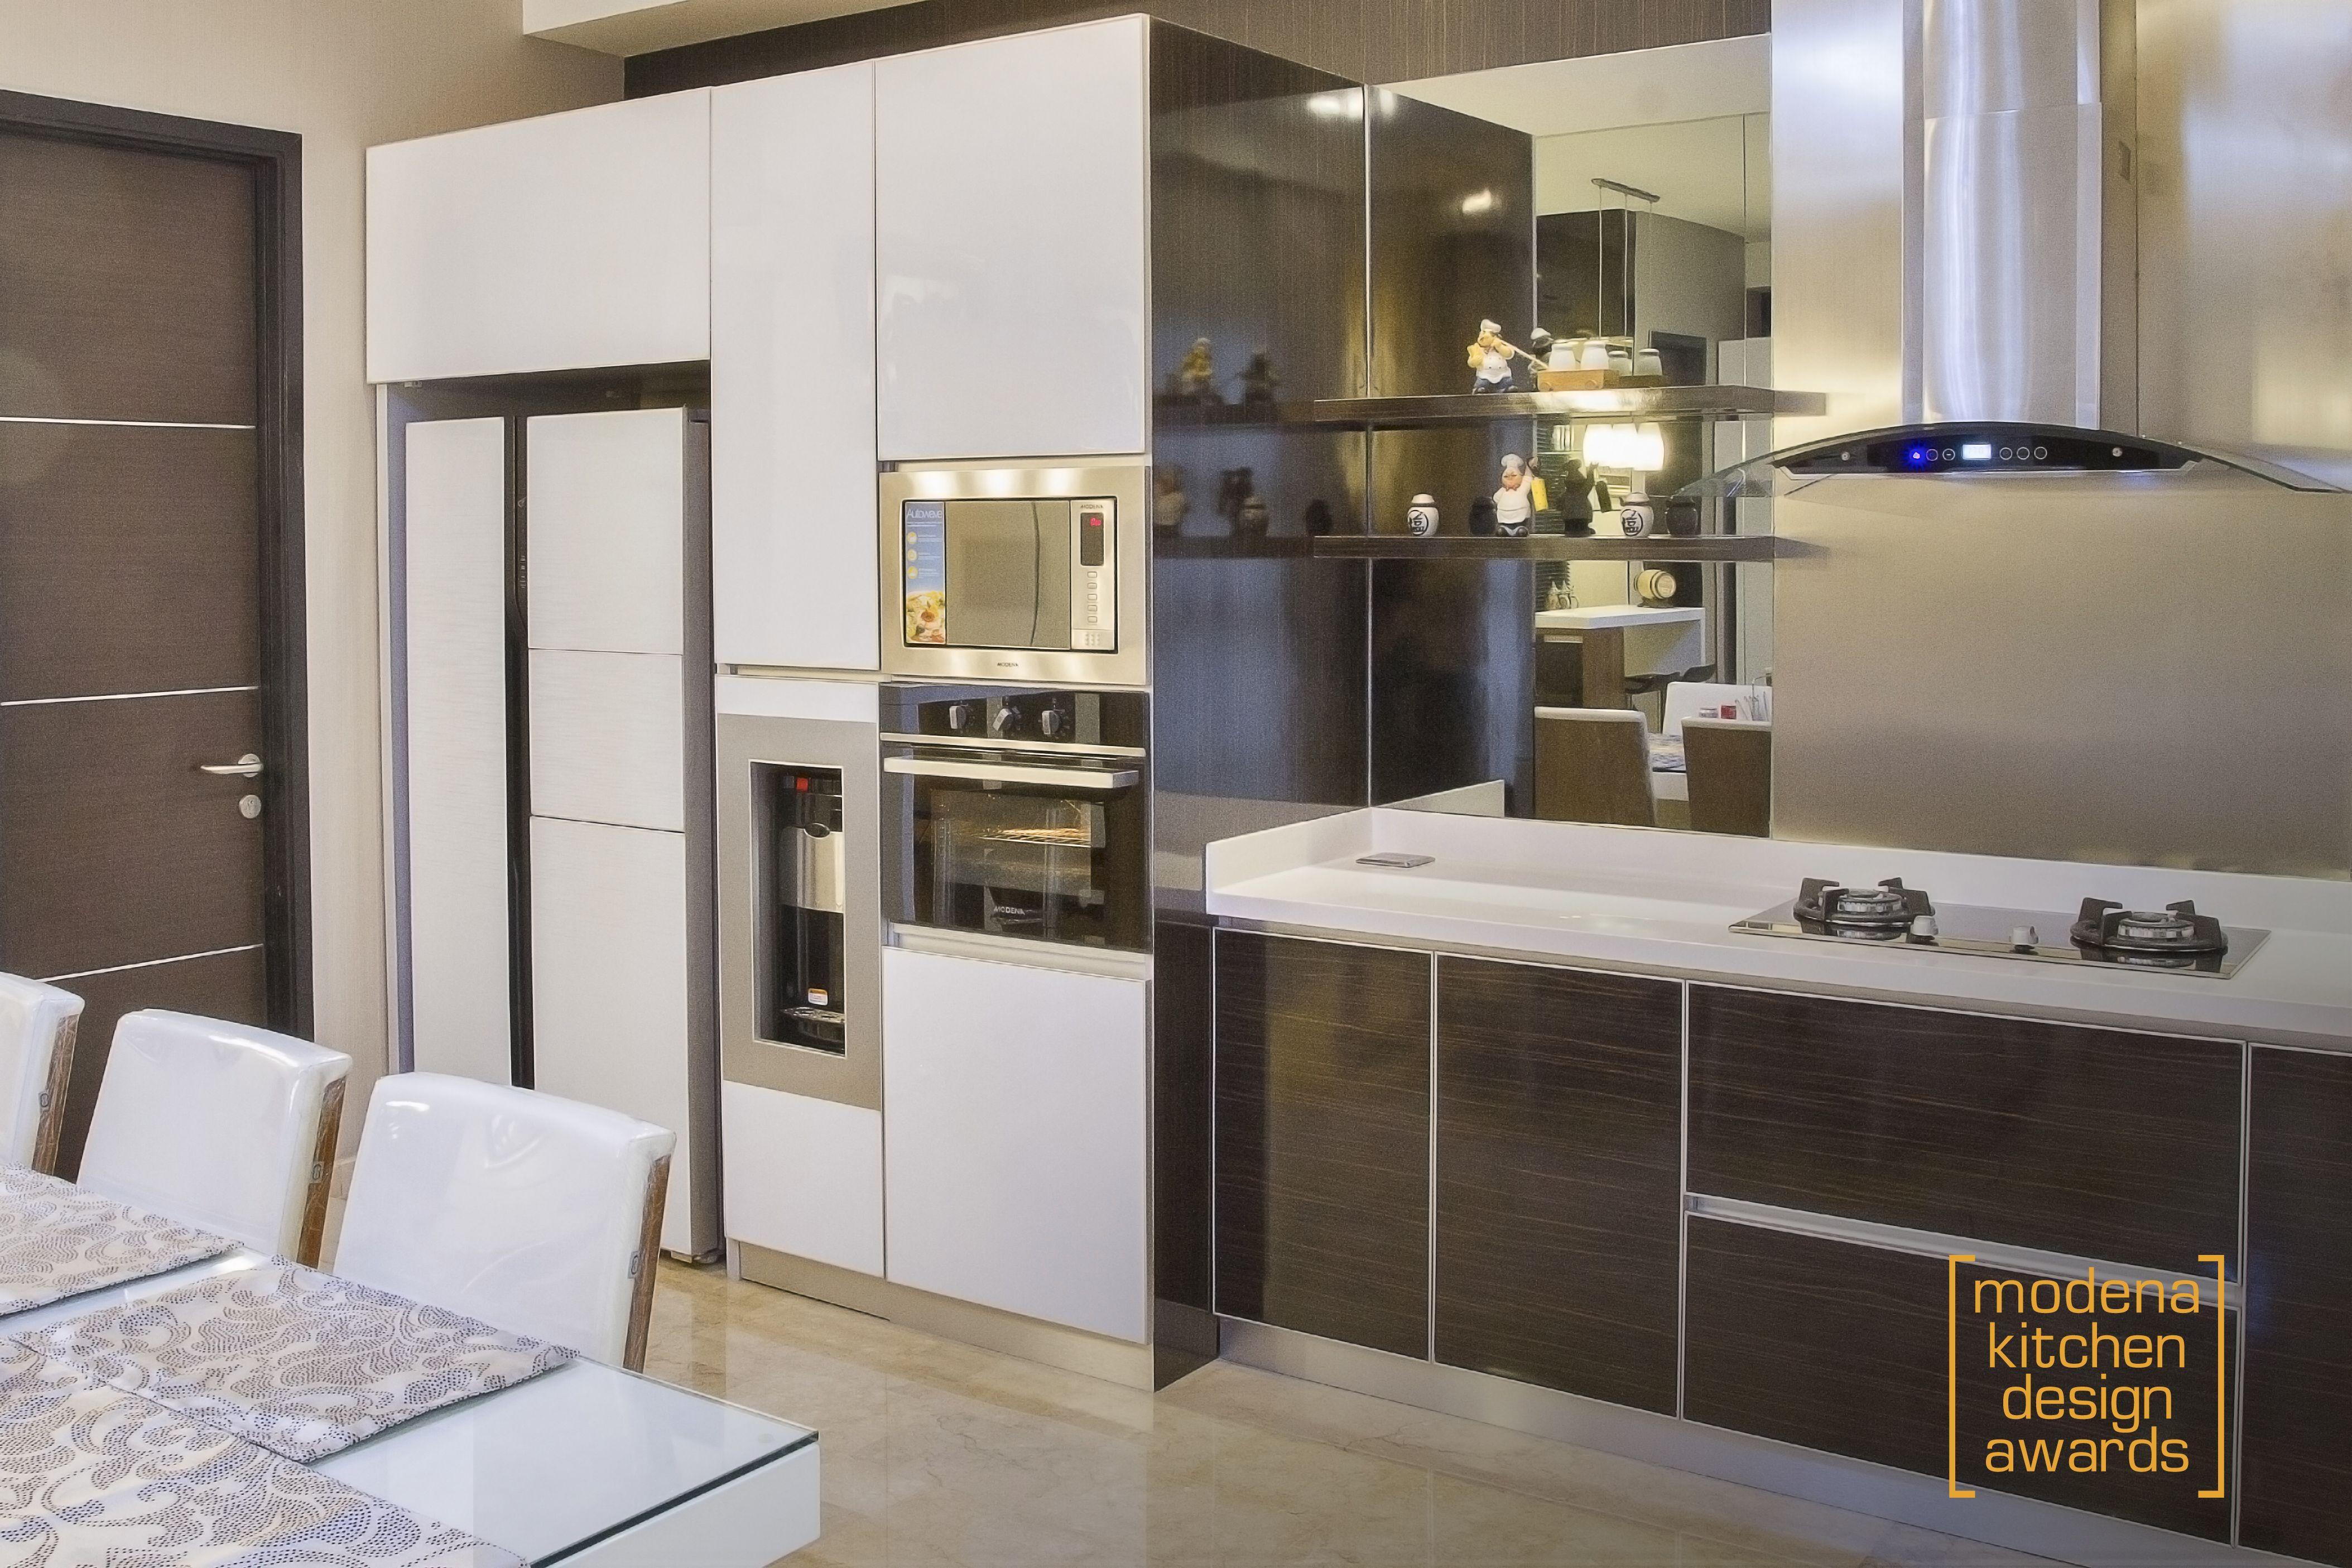 kategori kitchen maker dan consumer intenz interior mkda2014 kitchen makerdesign awardshome ideas